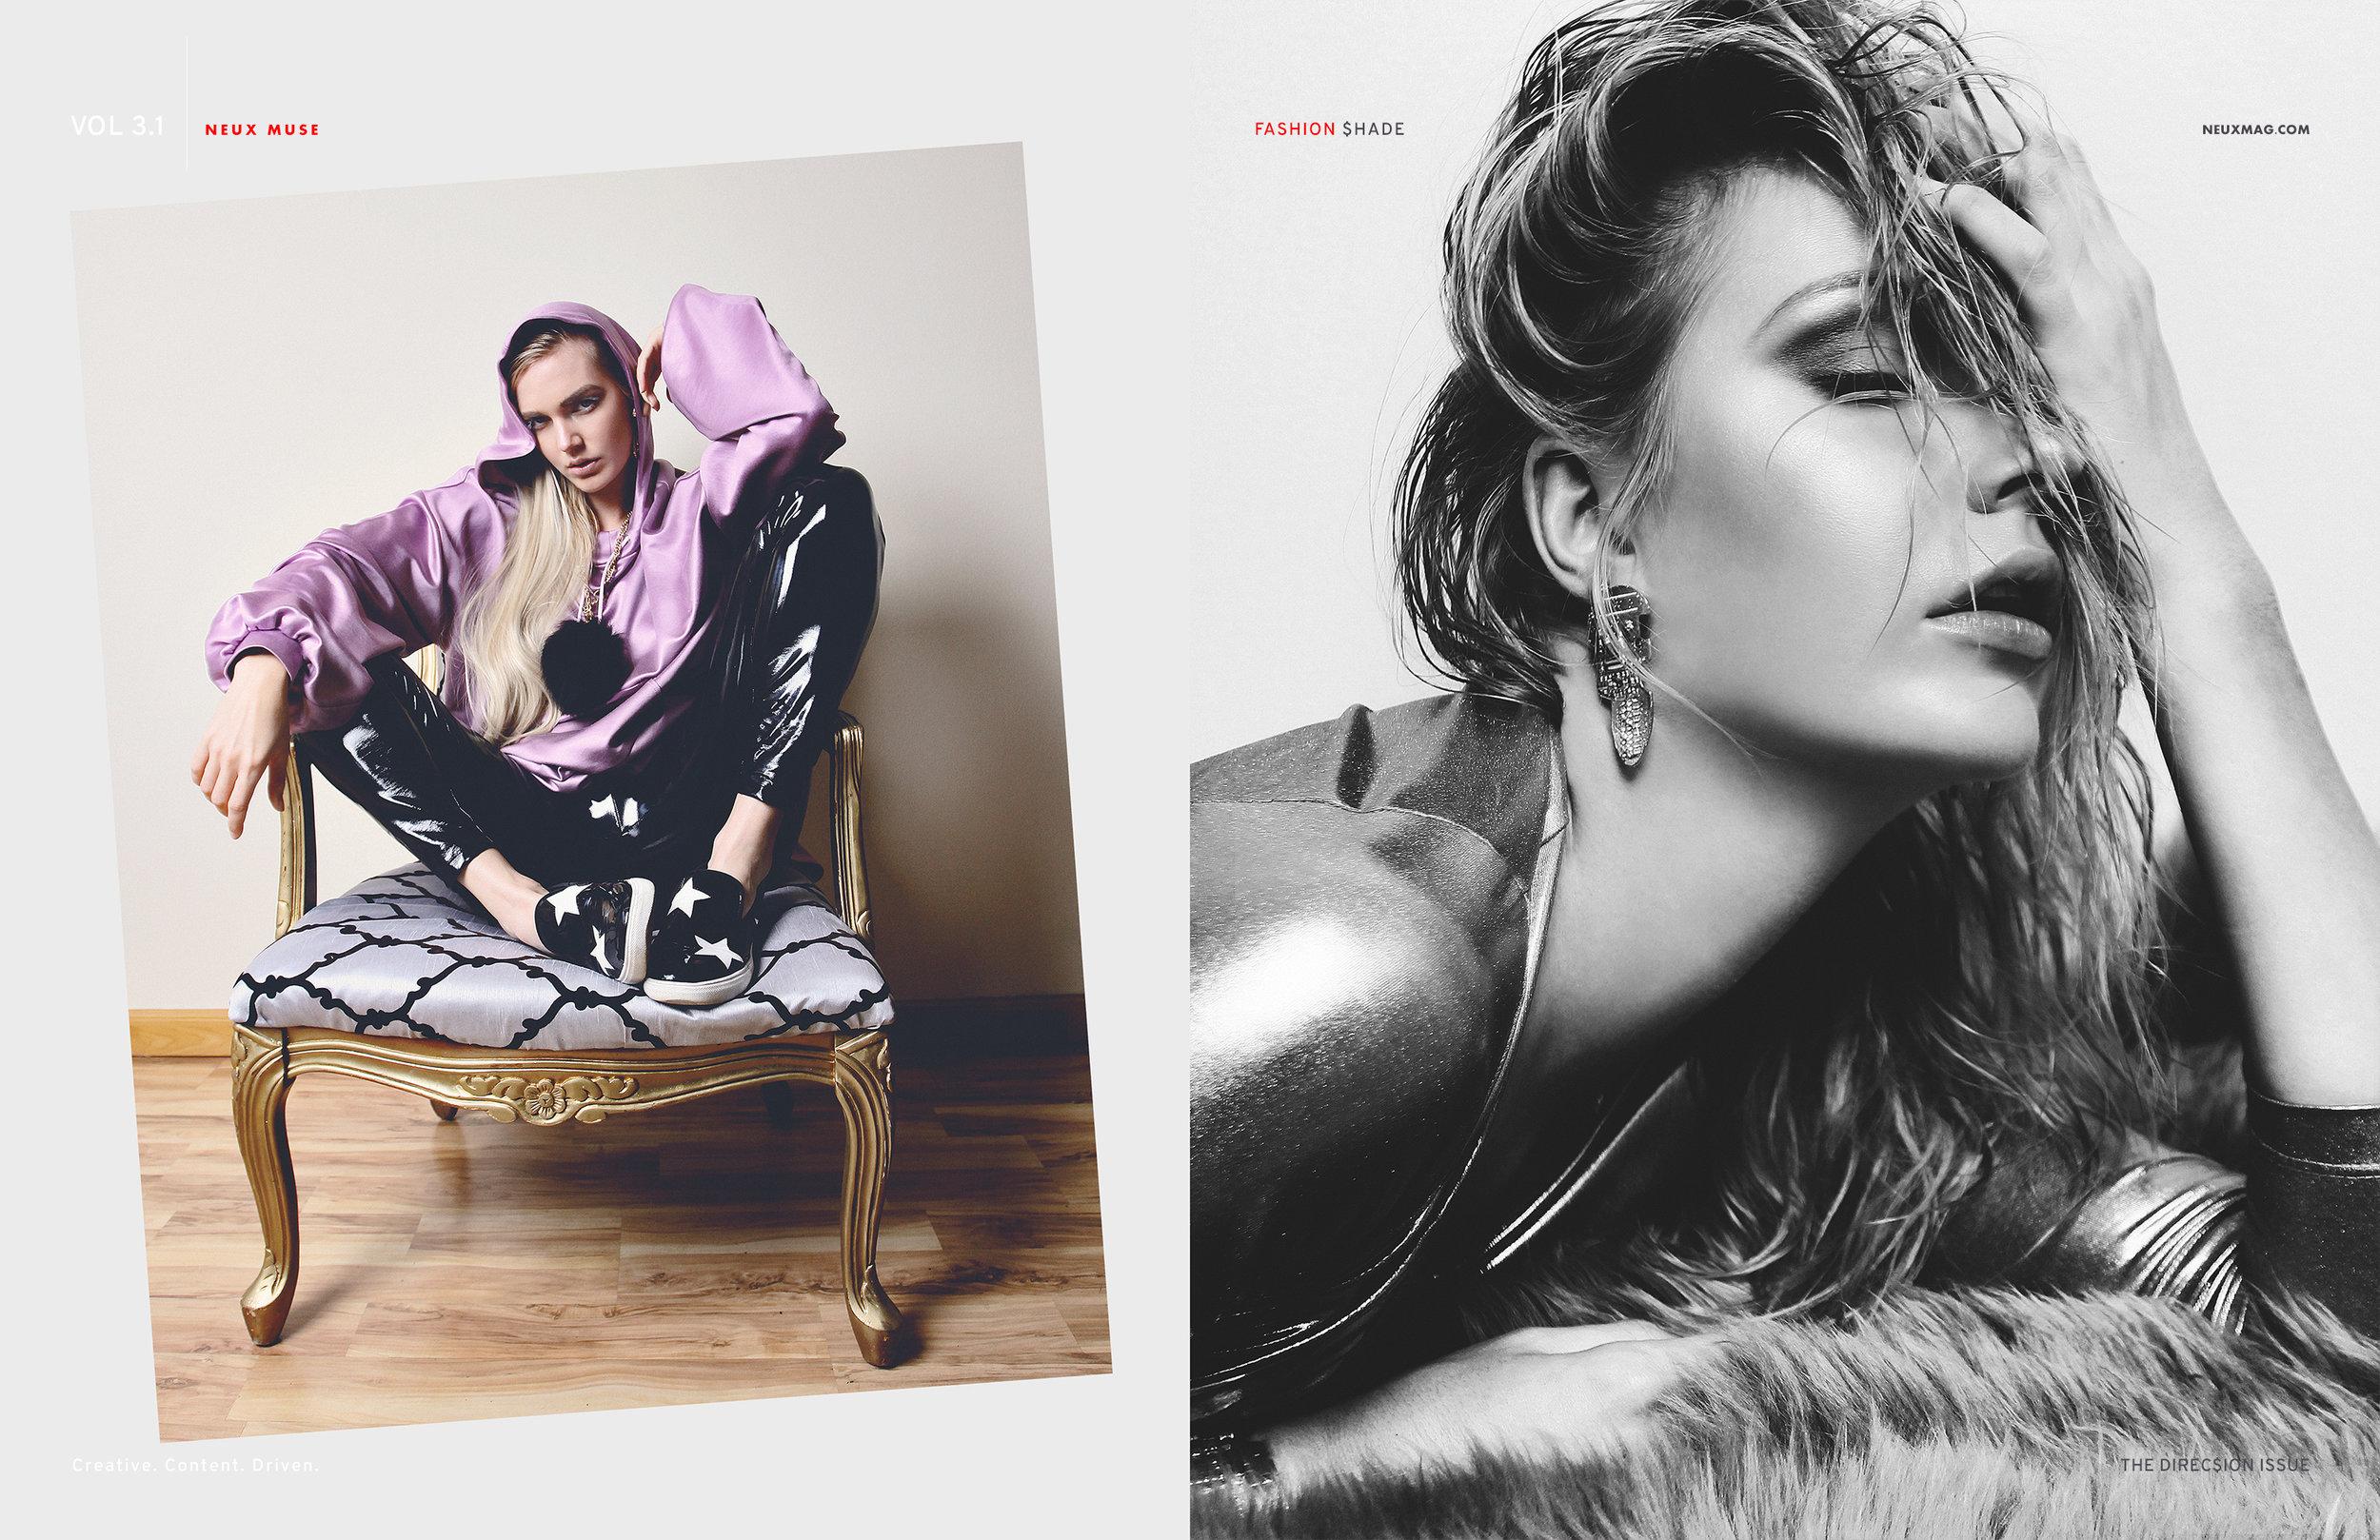 Fashion_Neux_Shade_layout_112017_hr_layout_08.jpg